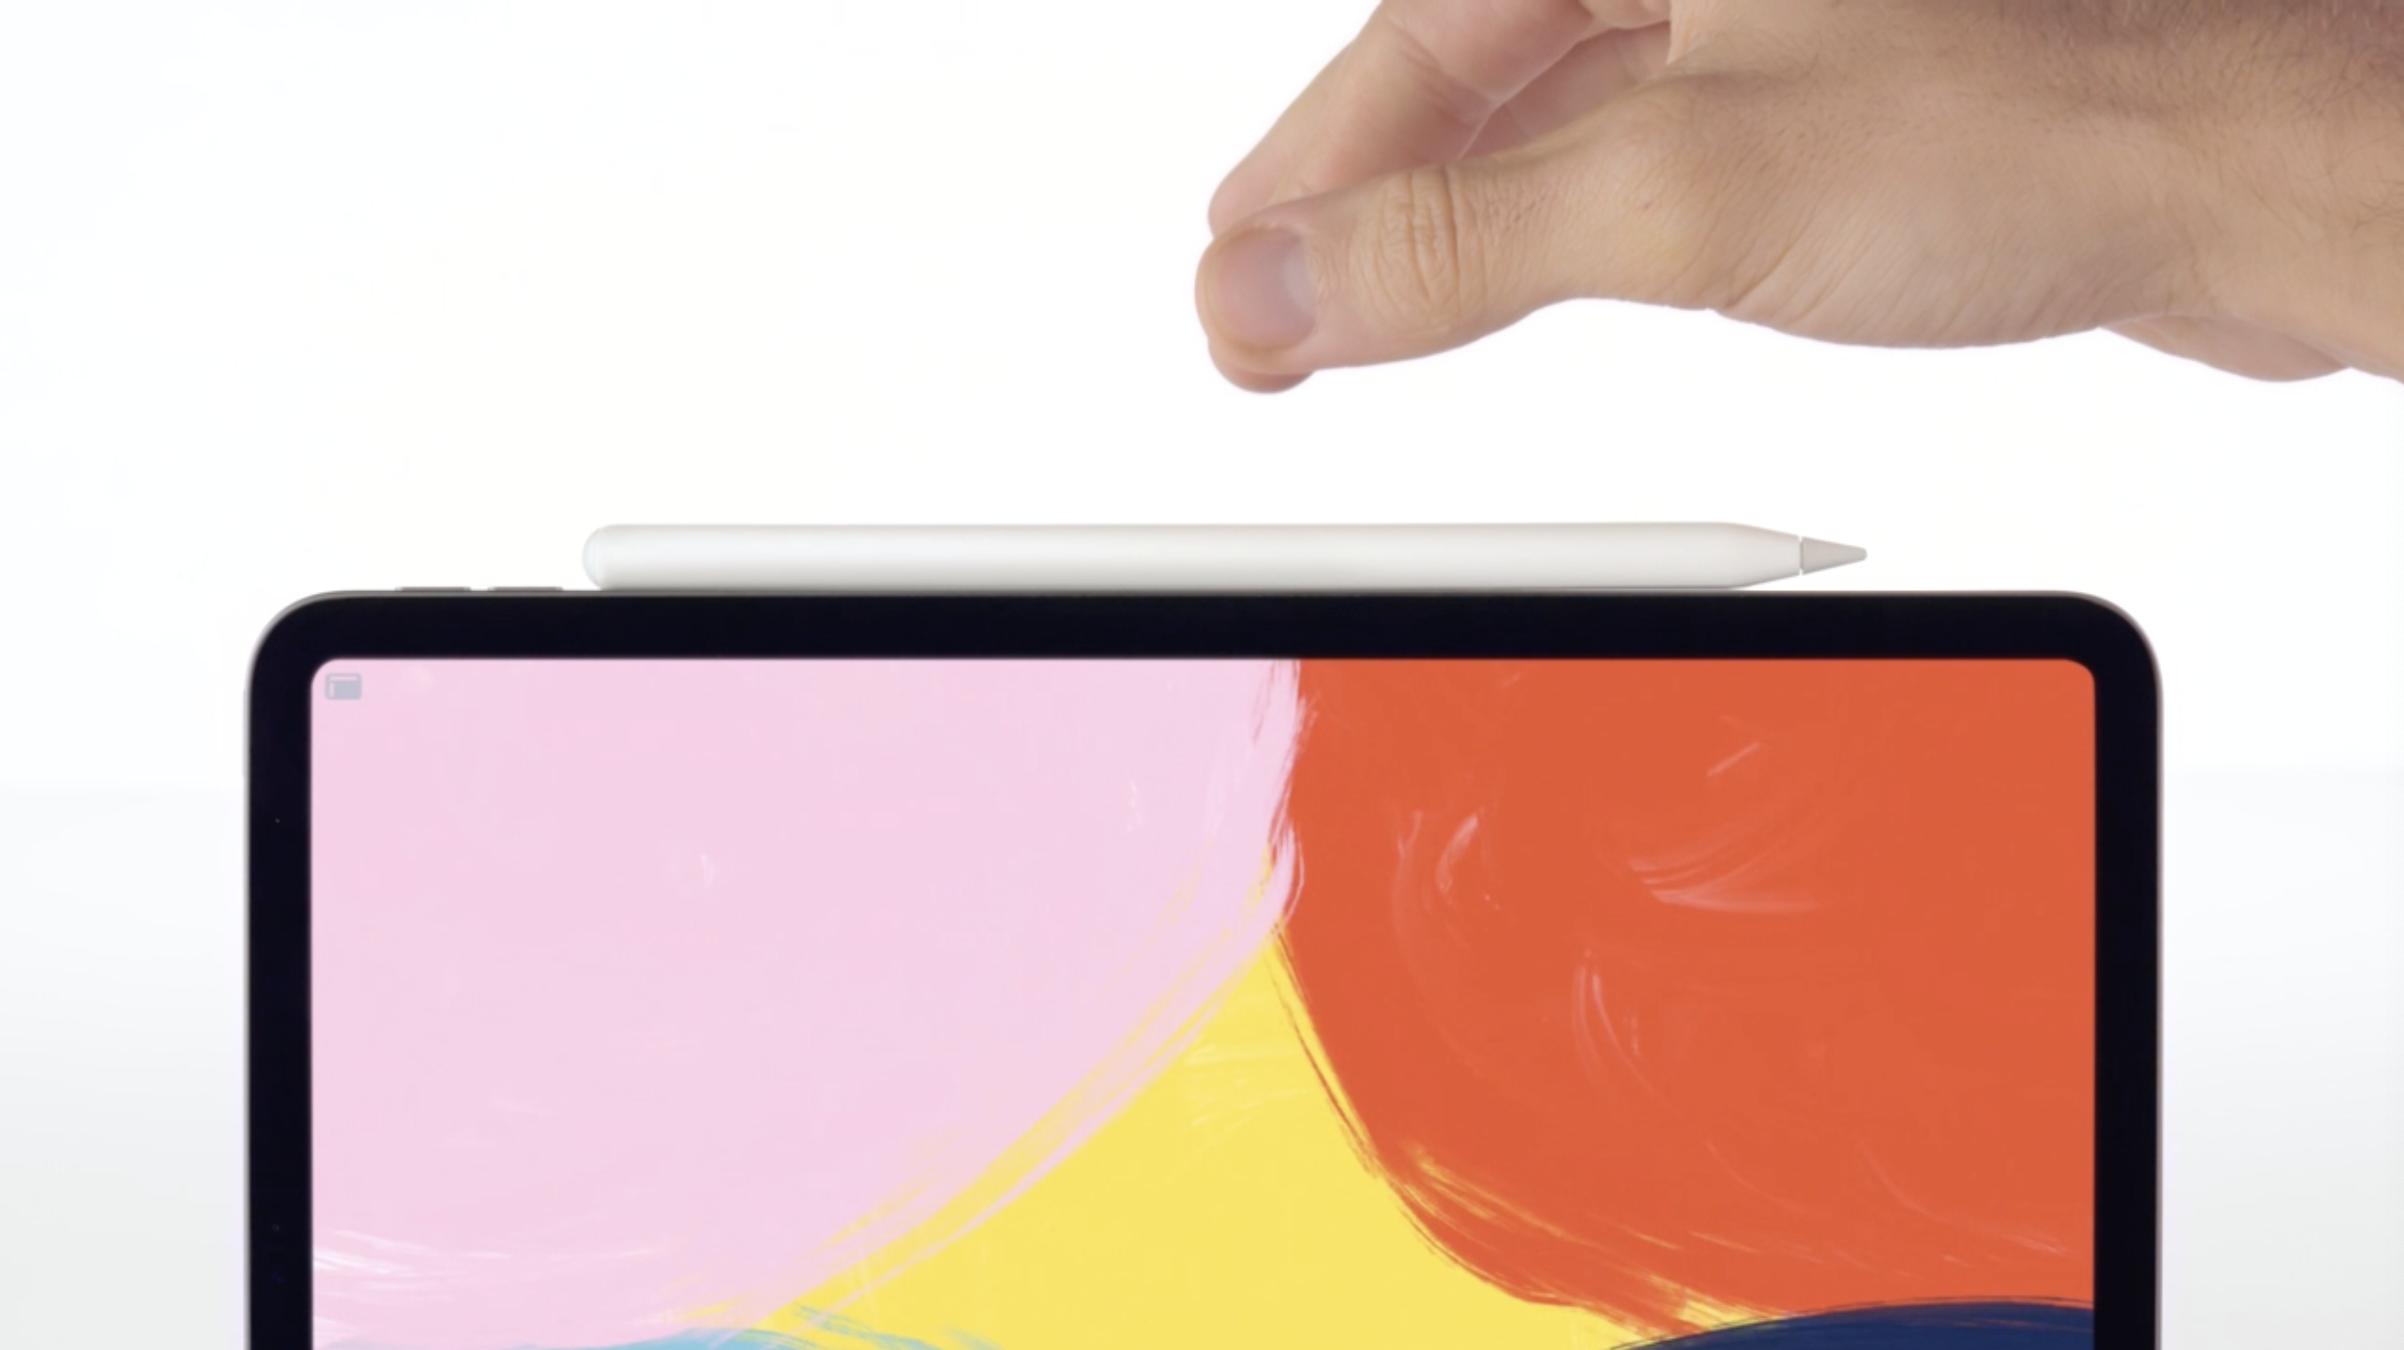 перо-ручка для нового iPad Pro